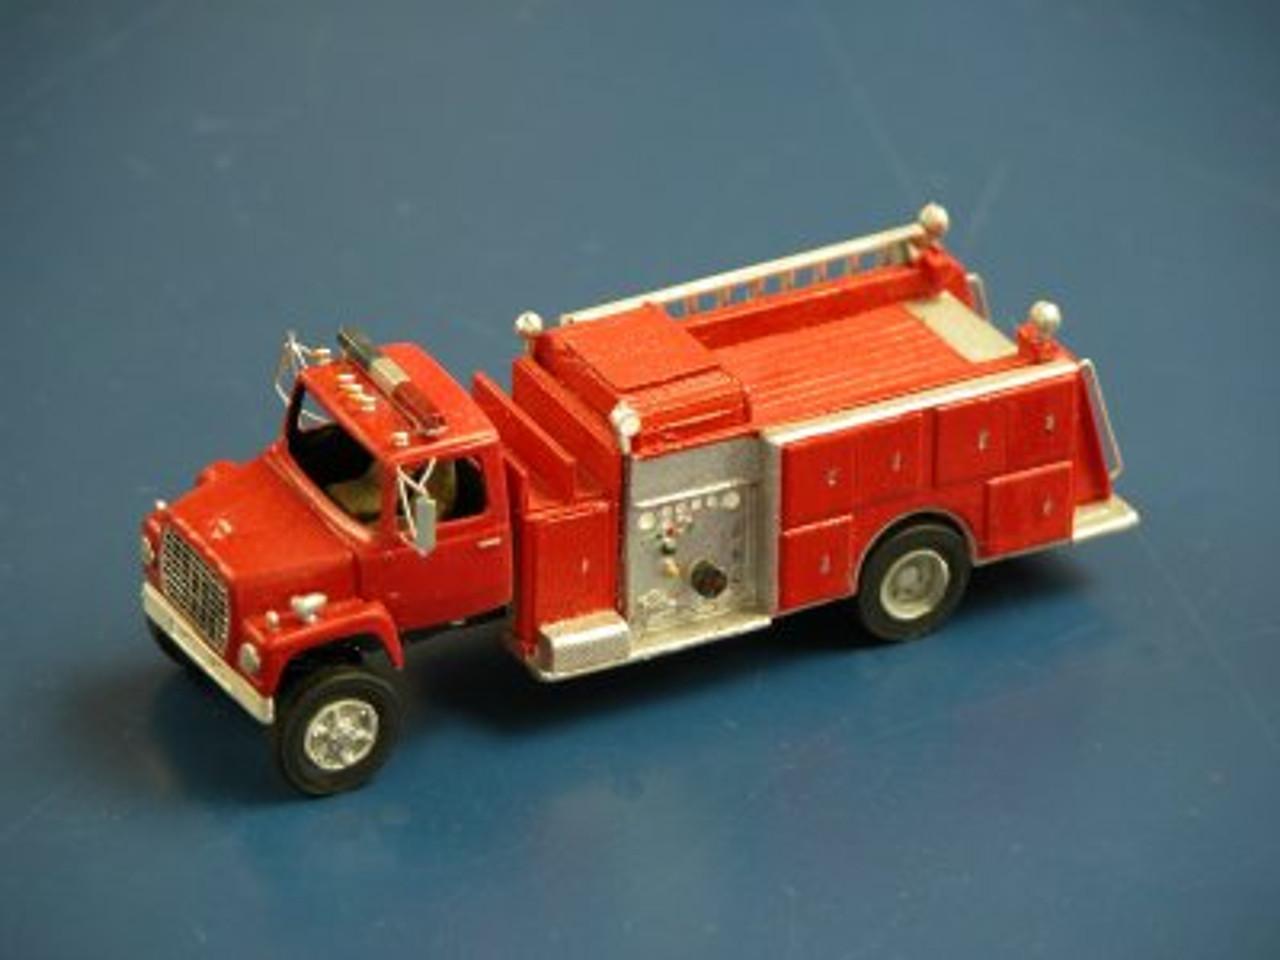 1990 Ford LN 9000 Firetruck with Pierce Suburban Pumper Body Kit